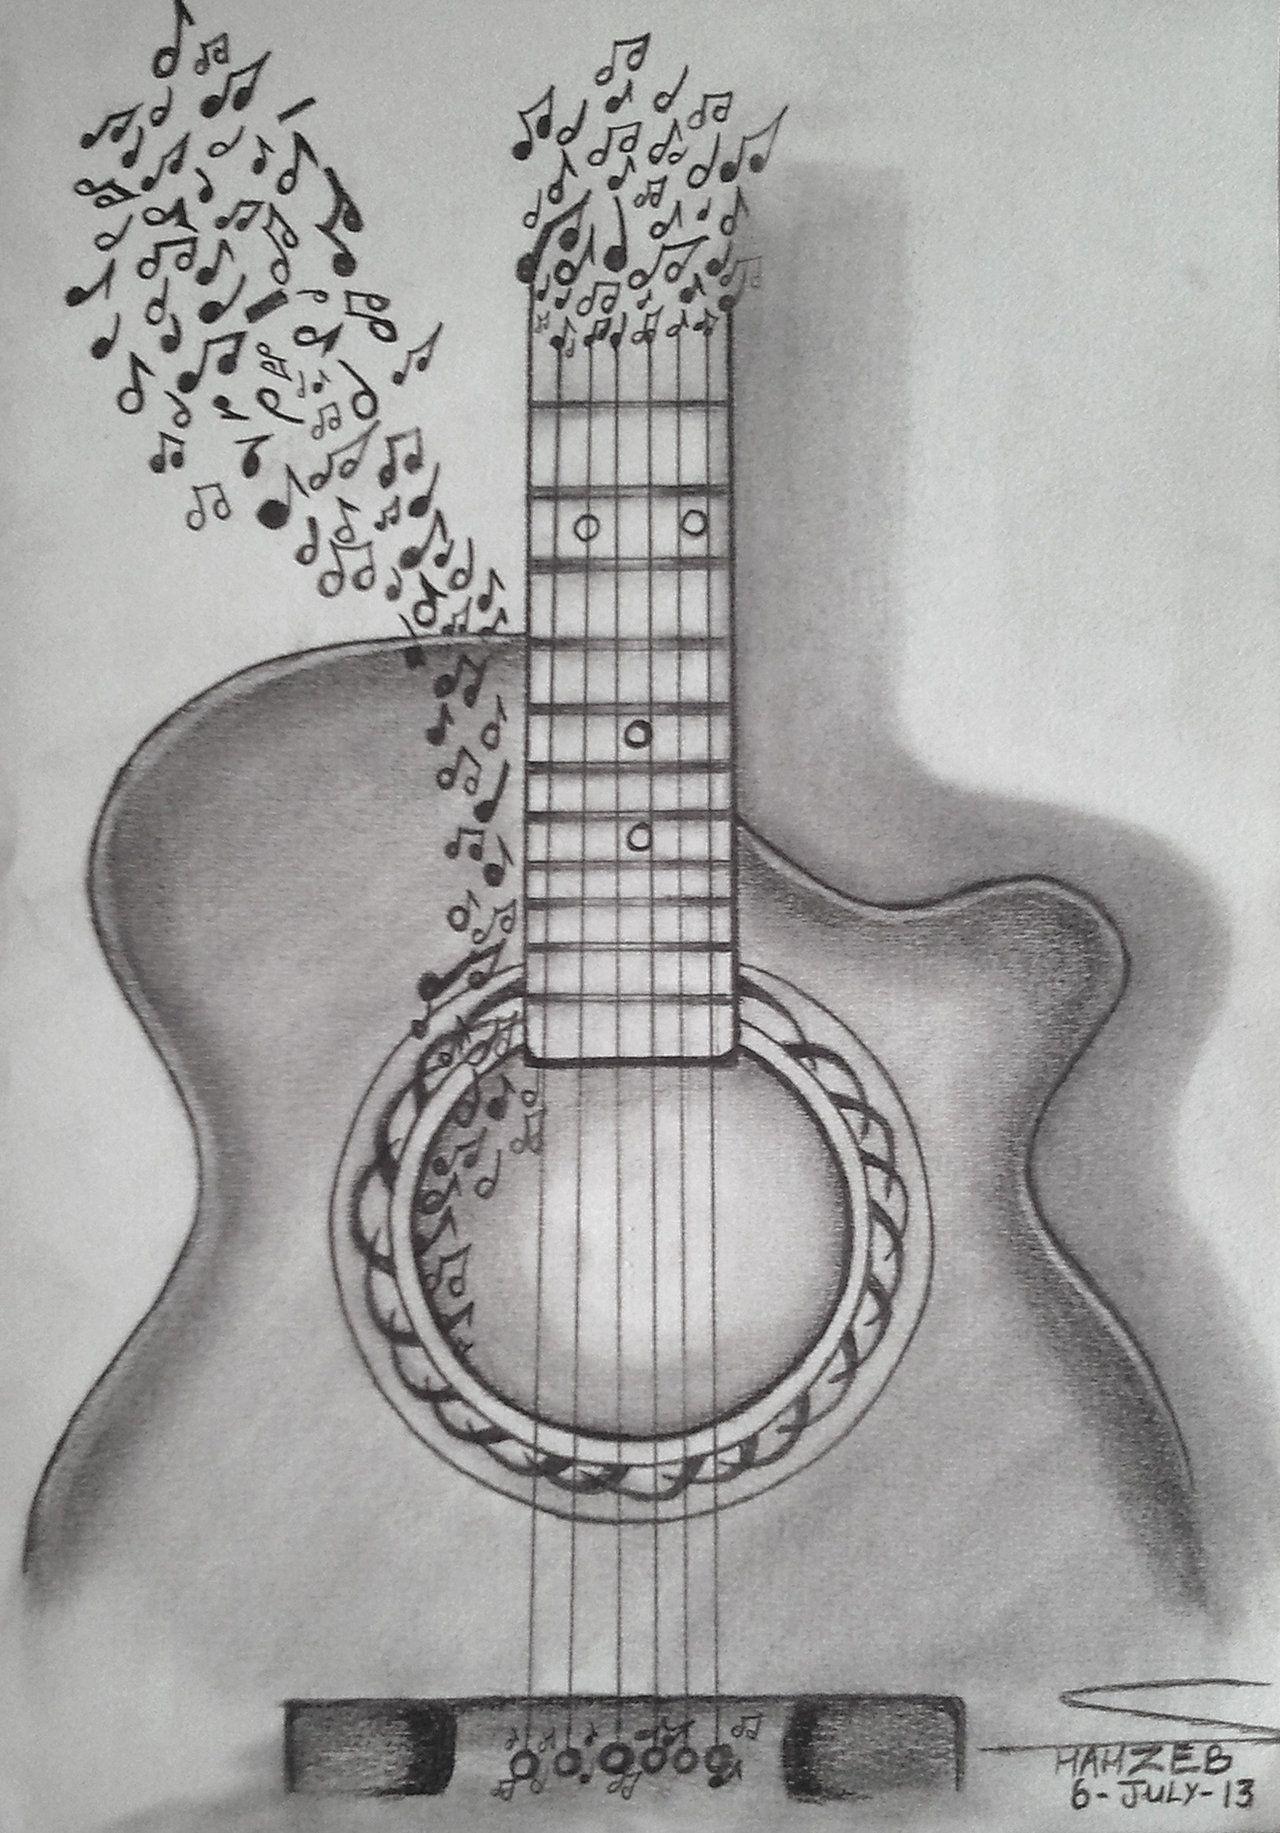 pencil art - Google Search | Art and Illustration ...